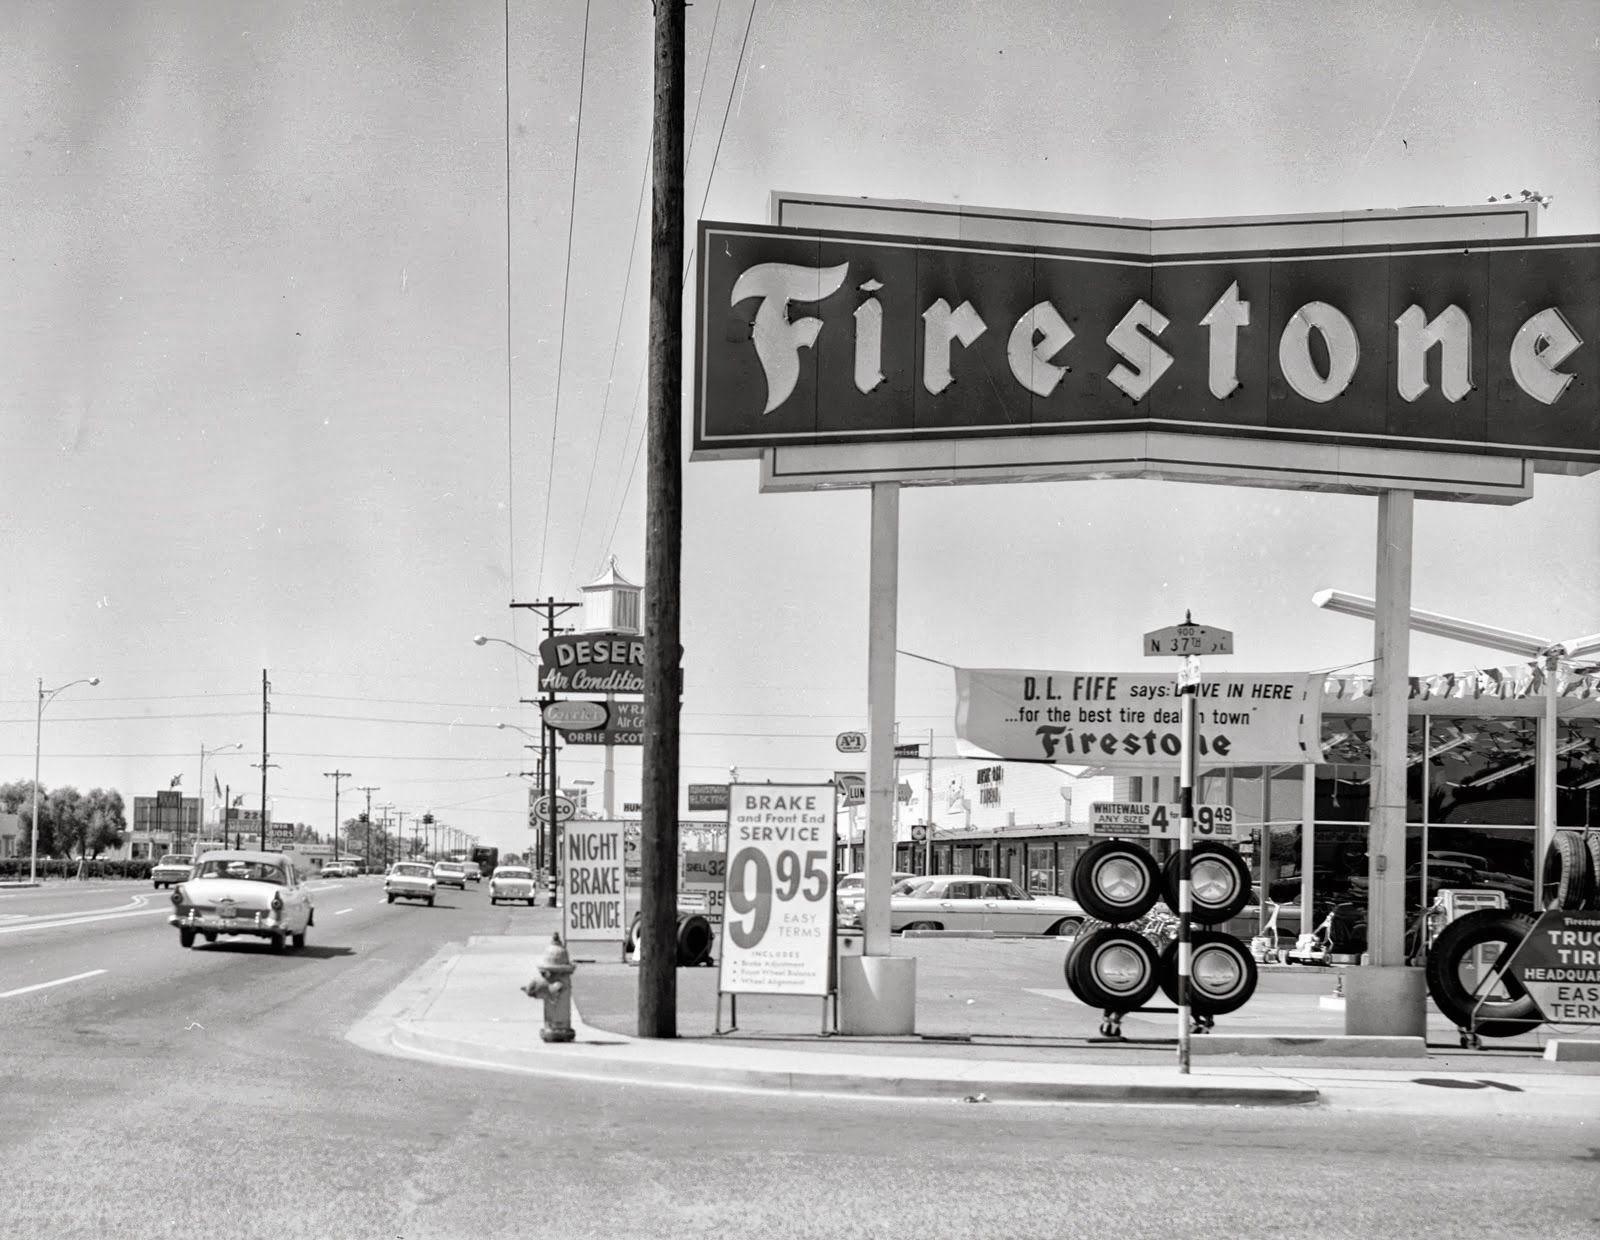 37th Street and Thomas Rd Phoenix, AZ Firestone tires